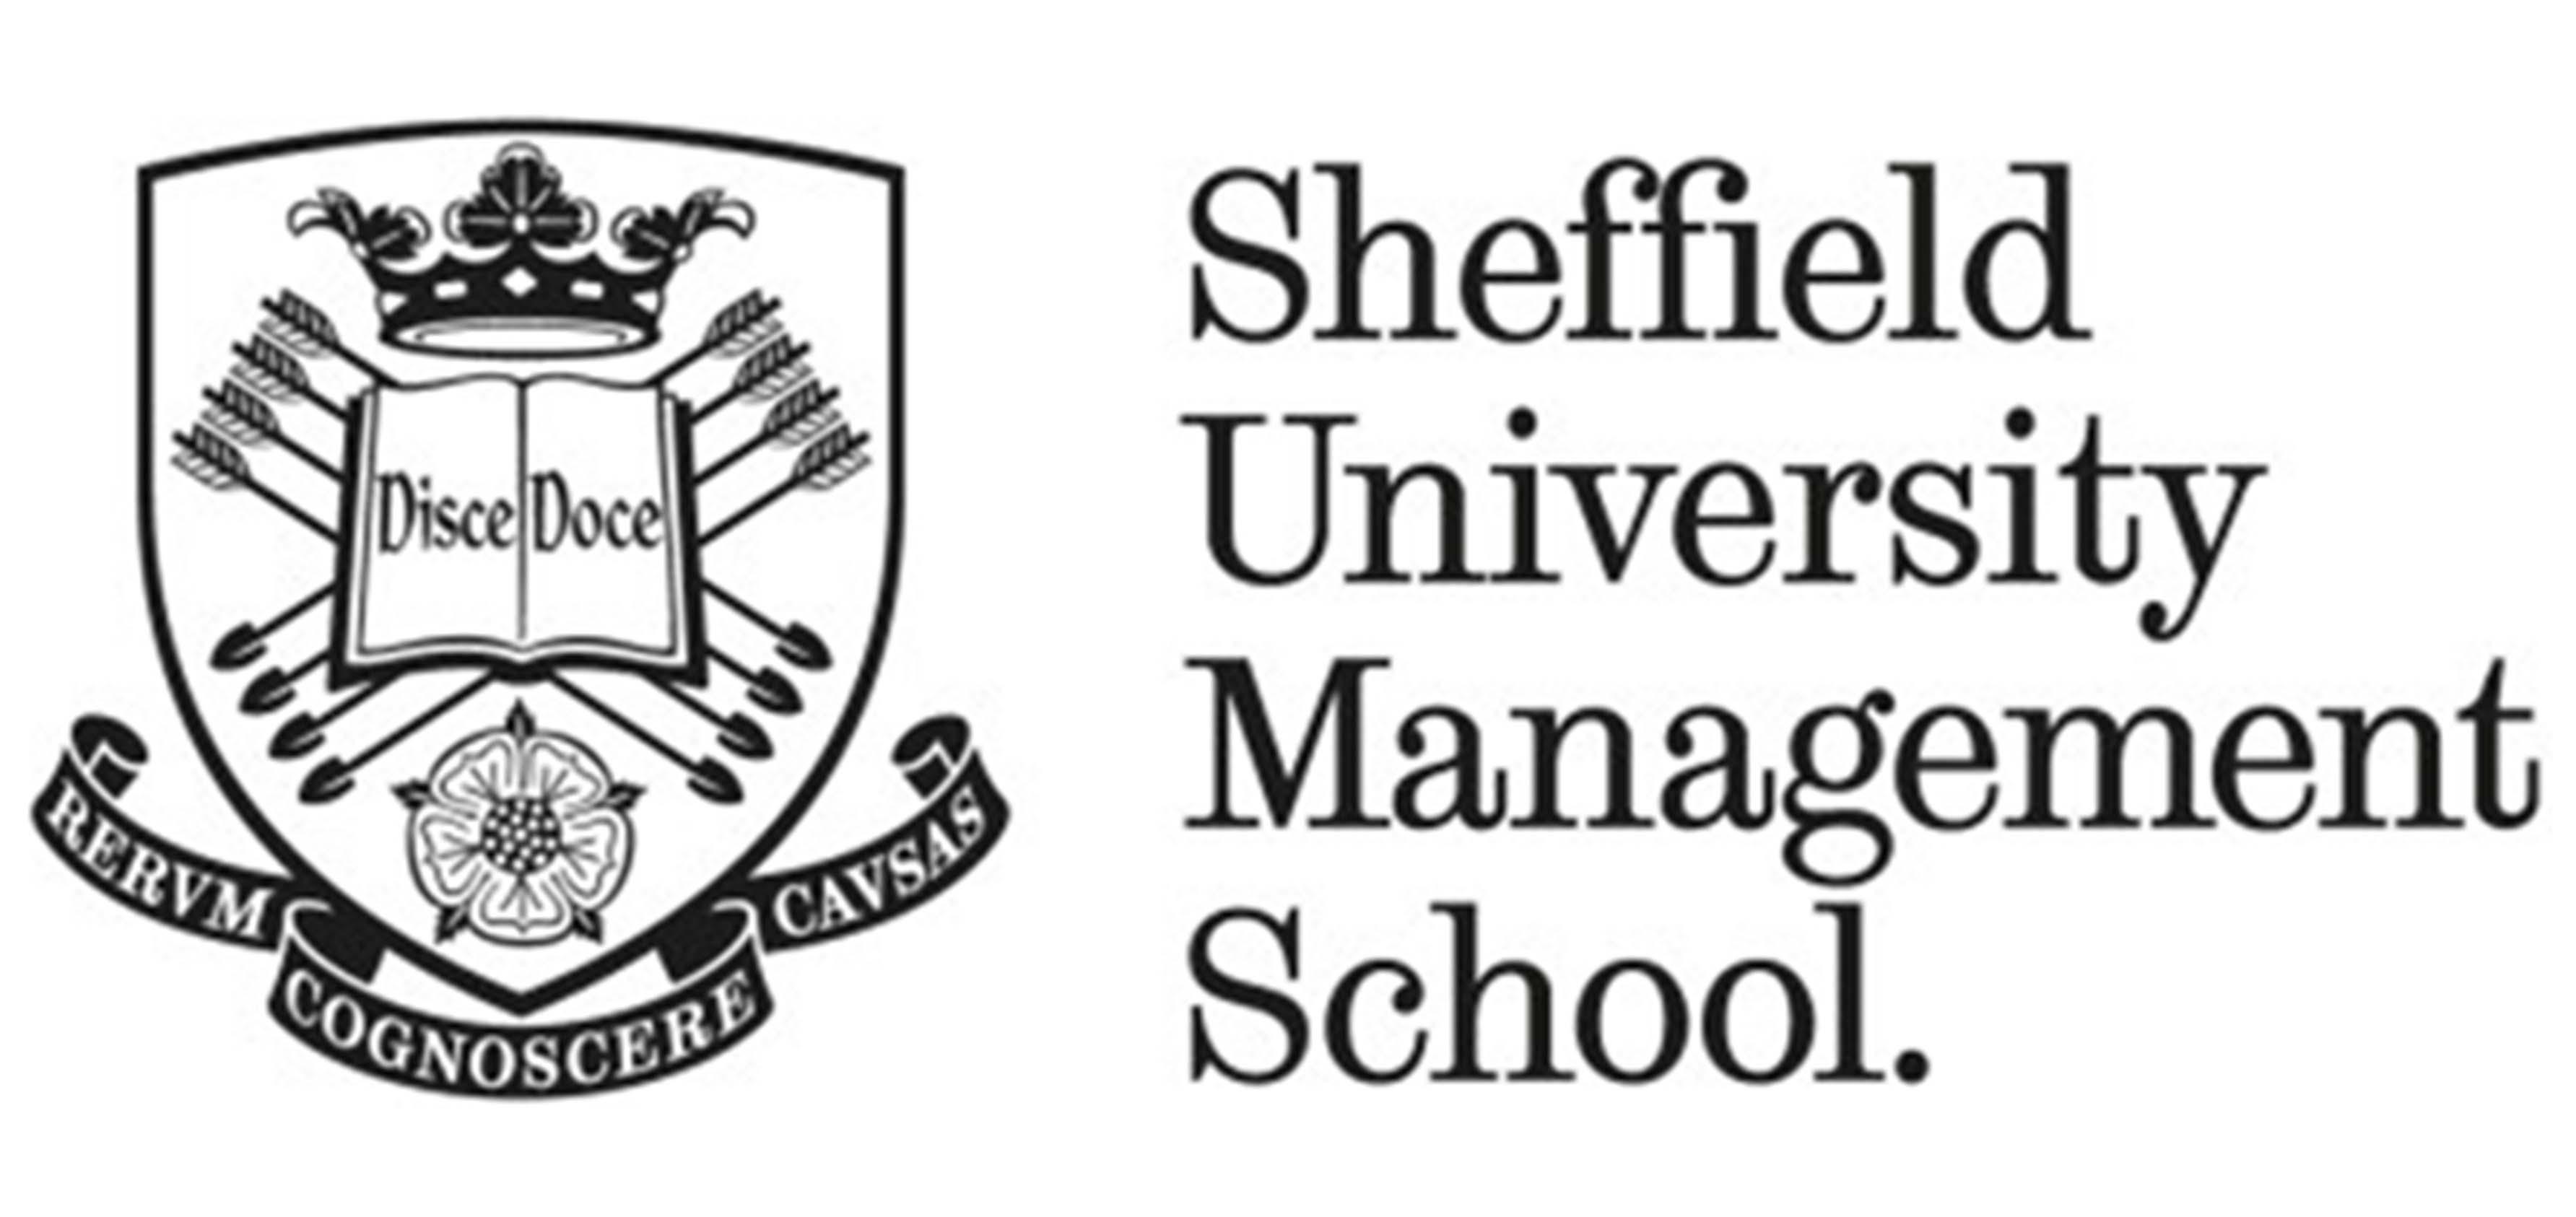 Sheffield Management school